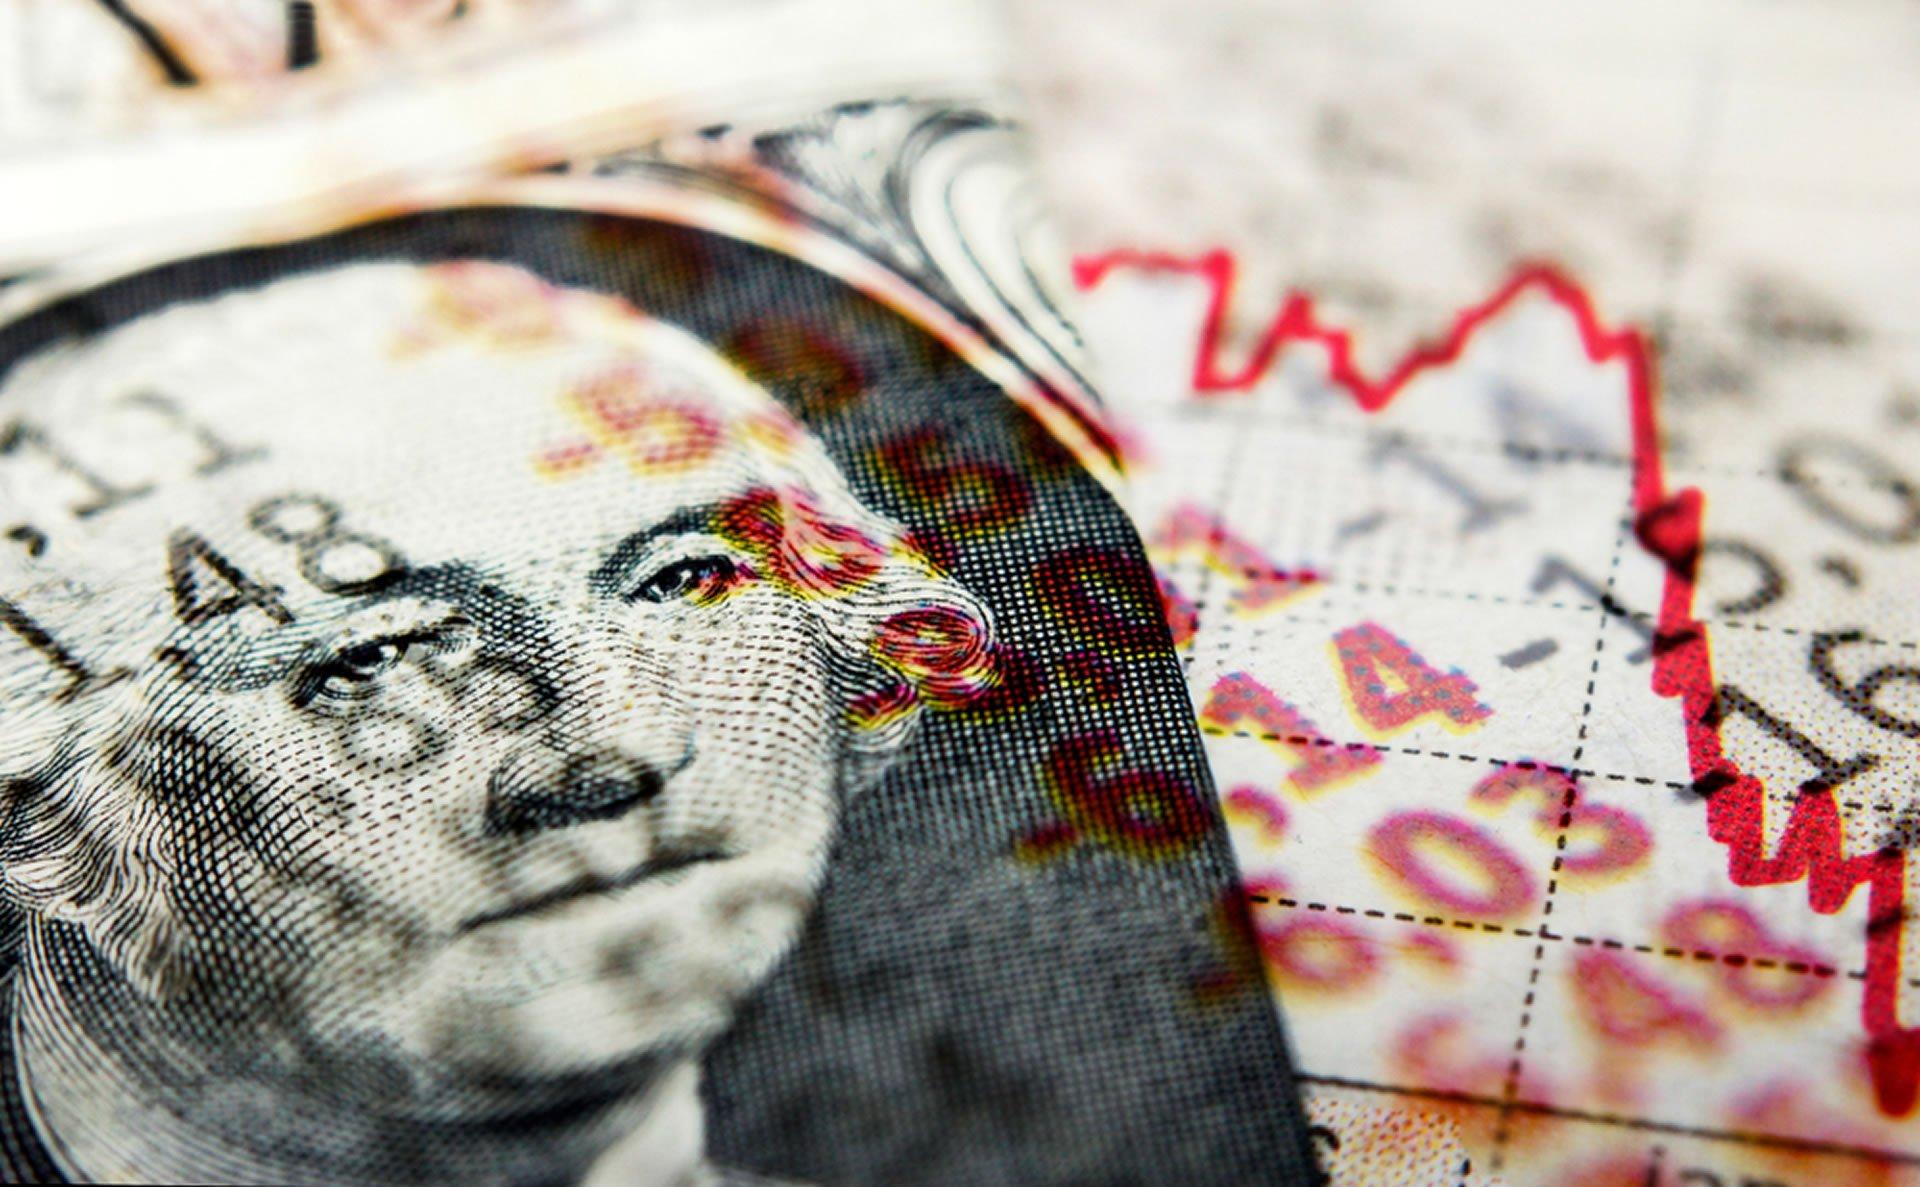 bitcoin dollar devalued